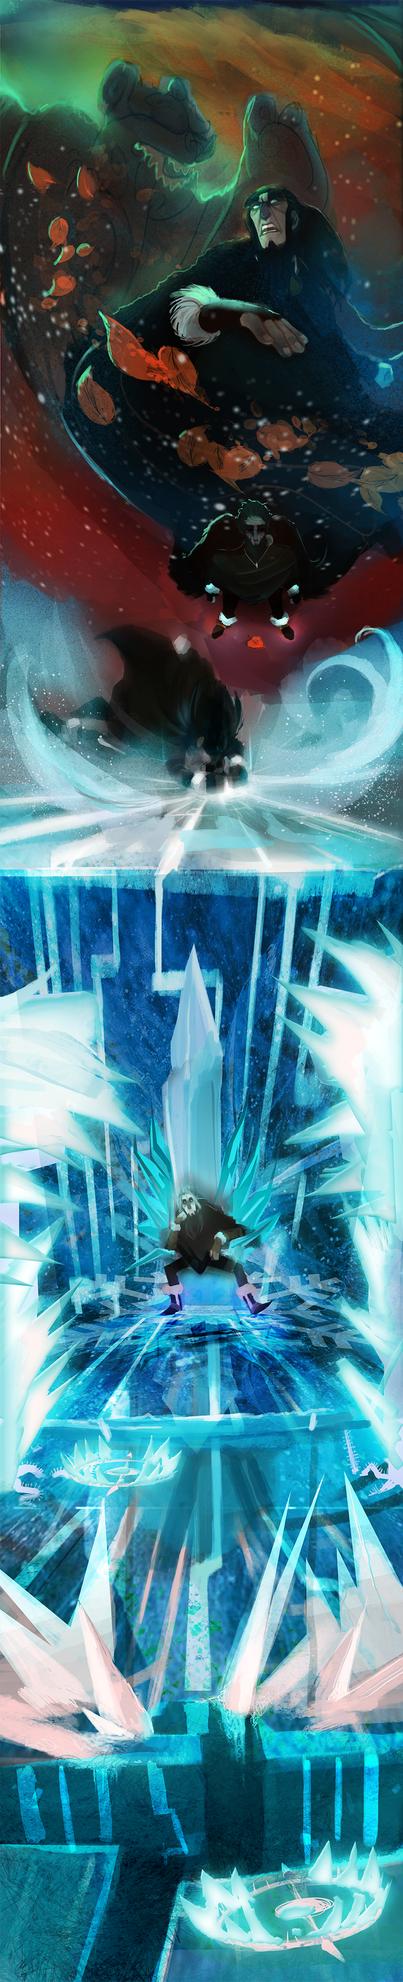 Frostblight:Saga (12) by michaeldoig